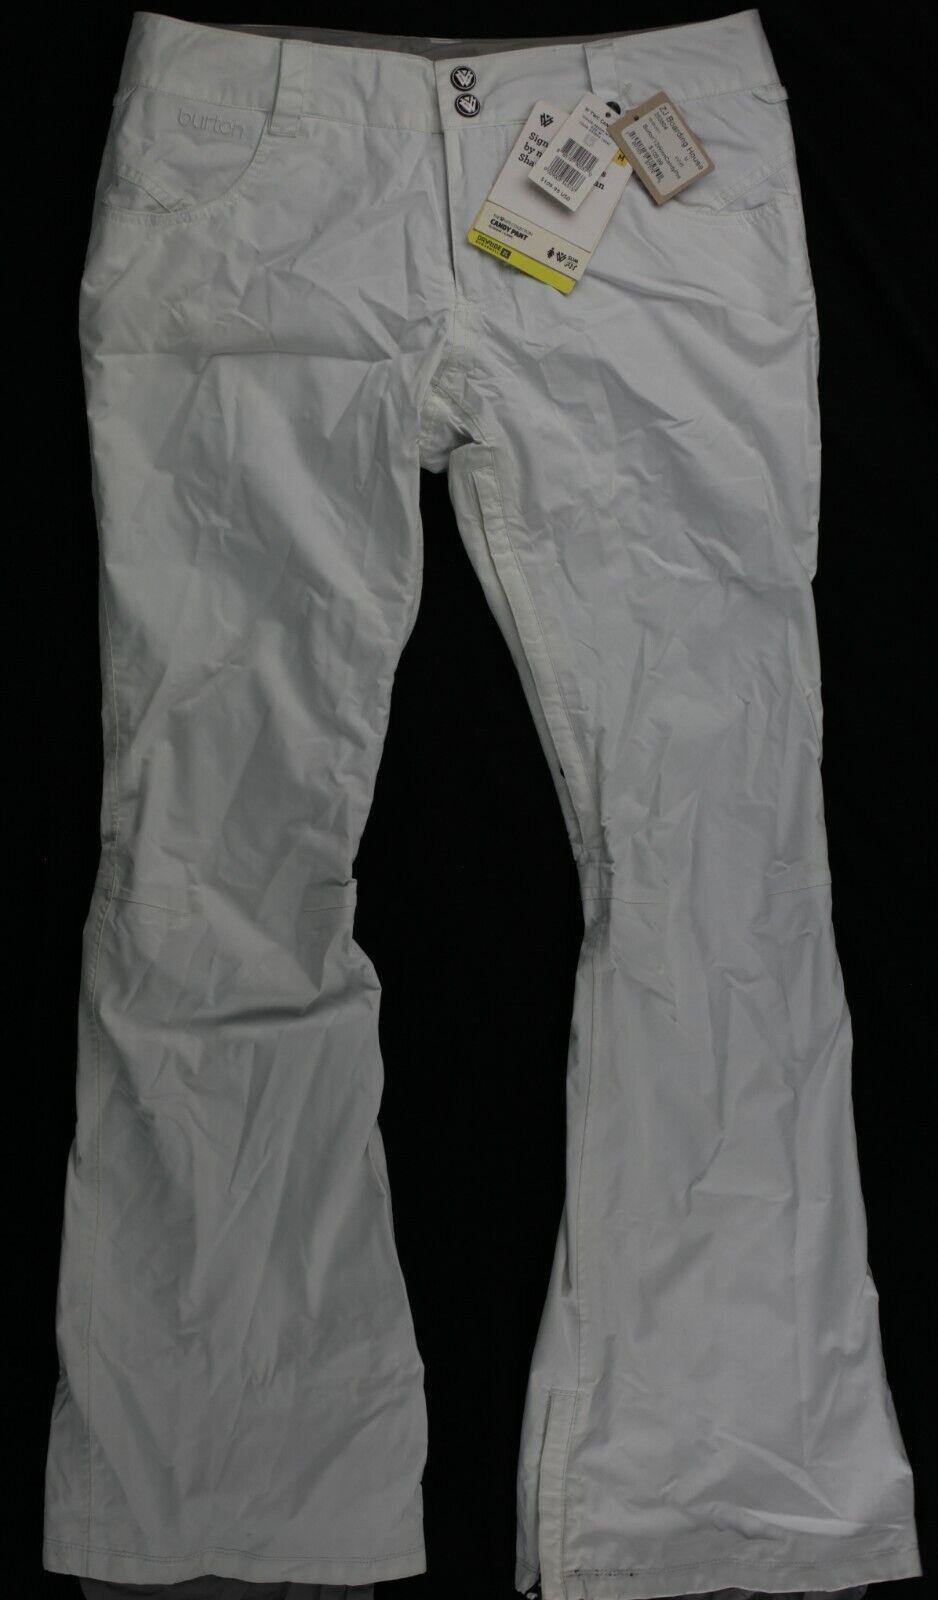 damen Burton Candy Pants Ski Snowboard Pants Weiß M NWT New with tags